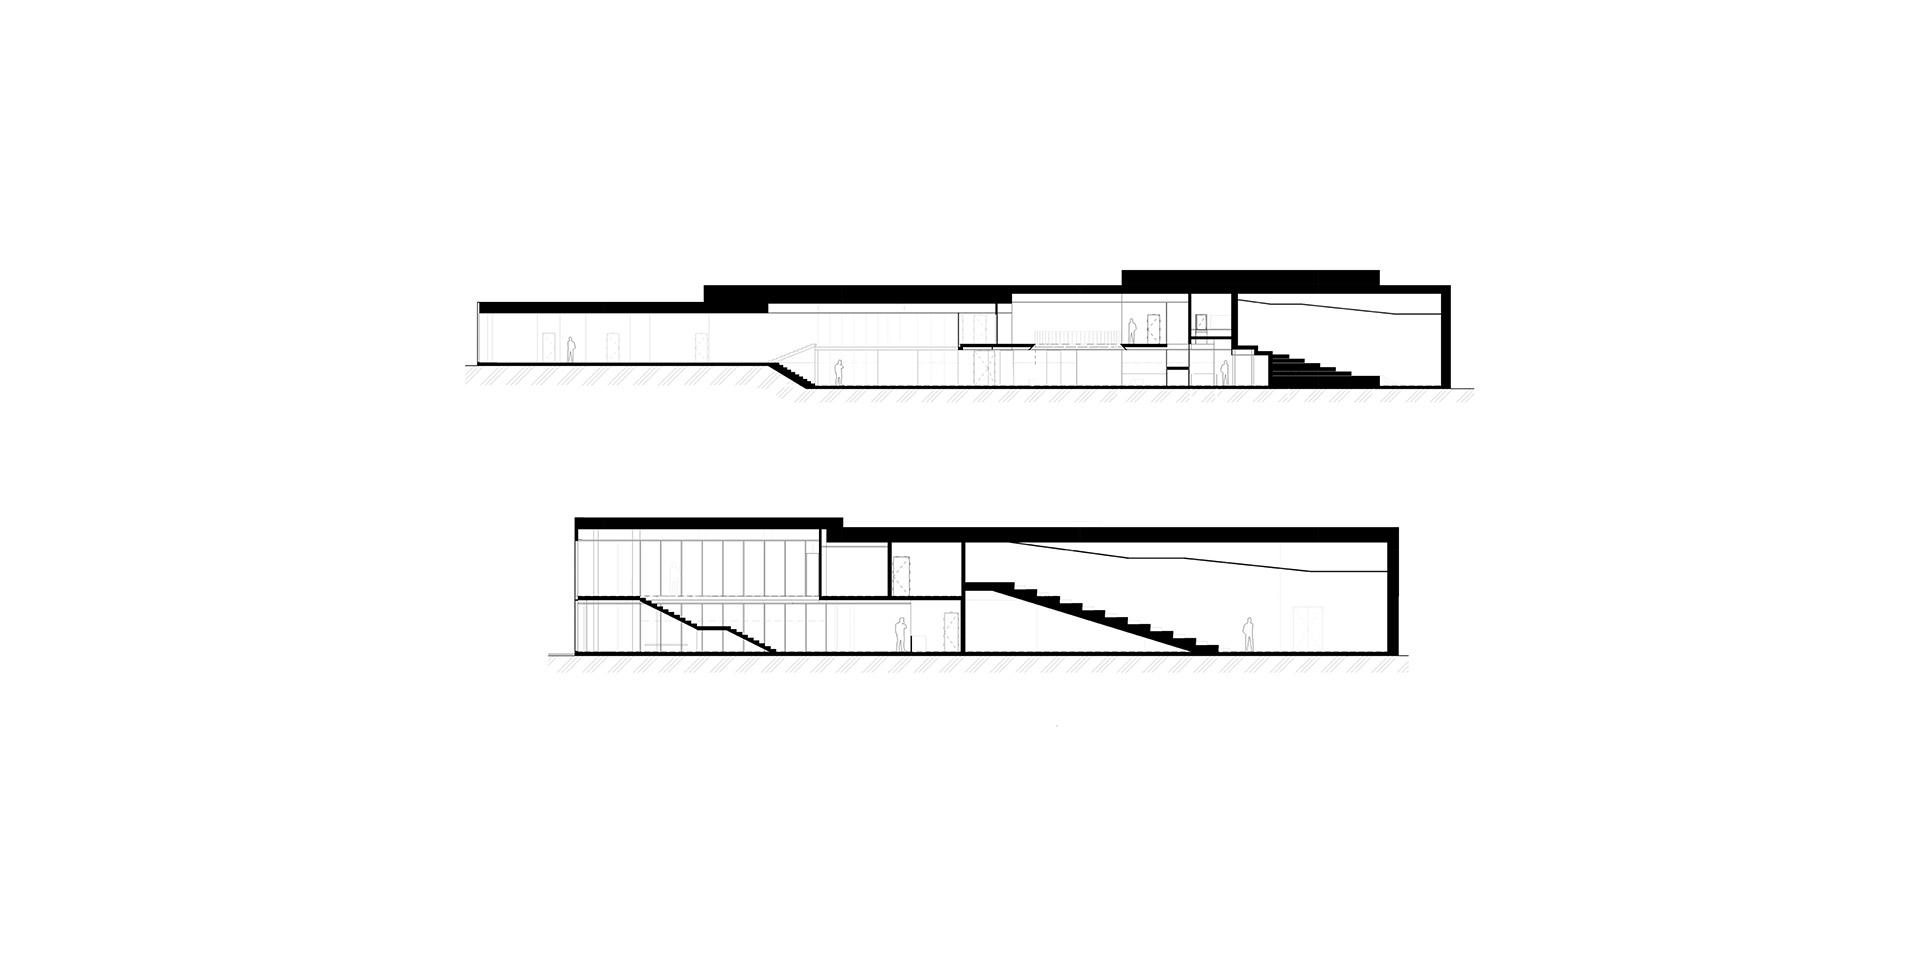 Reconstruction of the Horizon Cinema